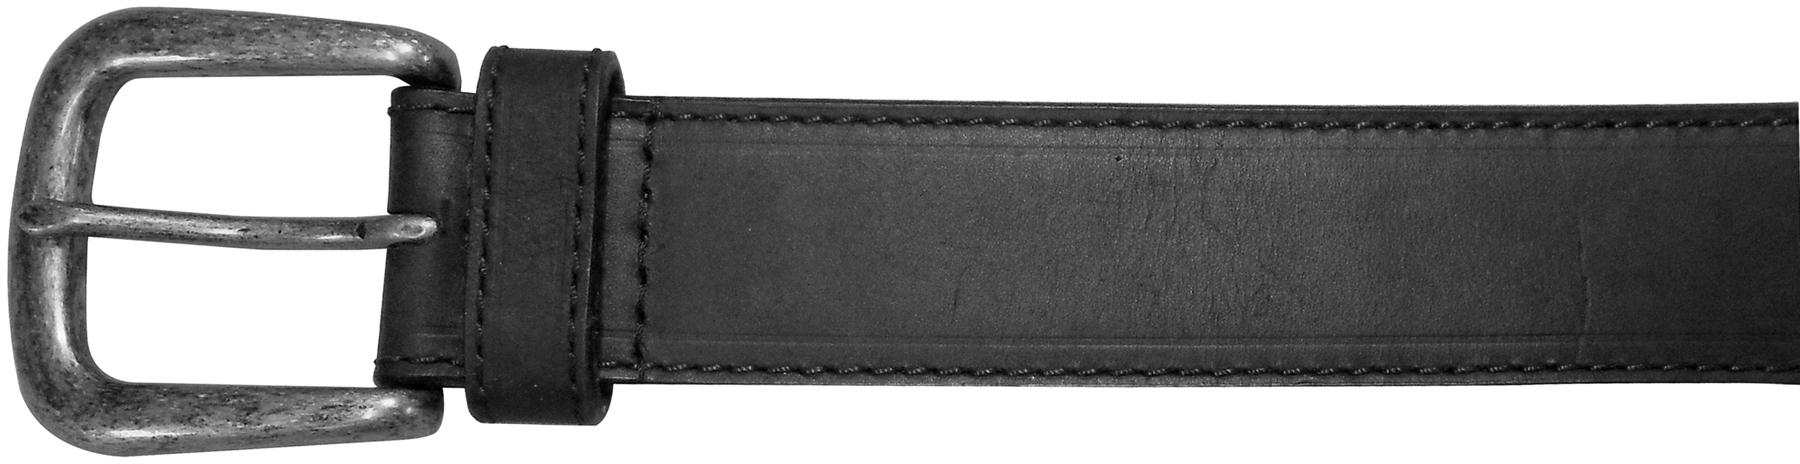 "10625410132 - 32"" Black Field & Stream Leather Belt"